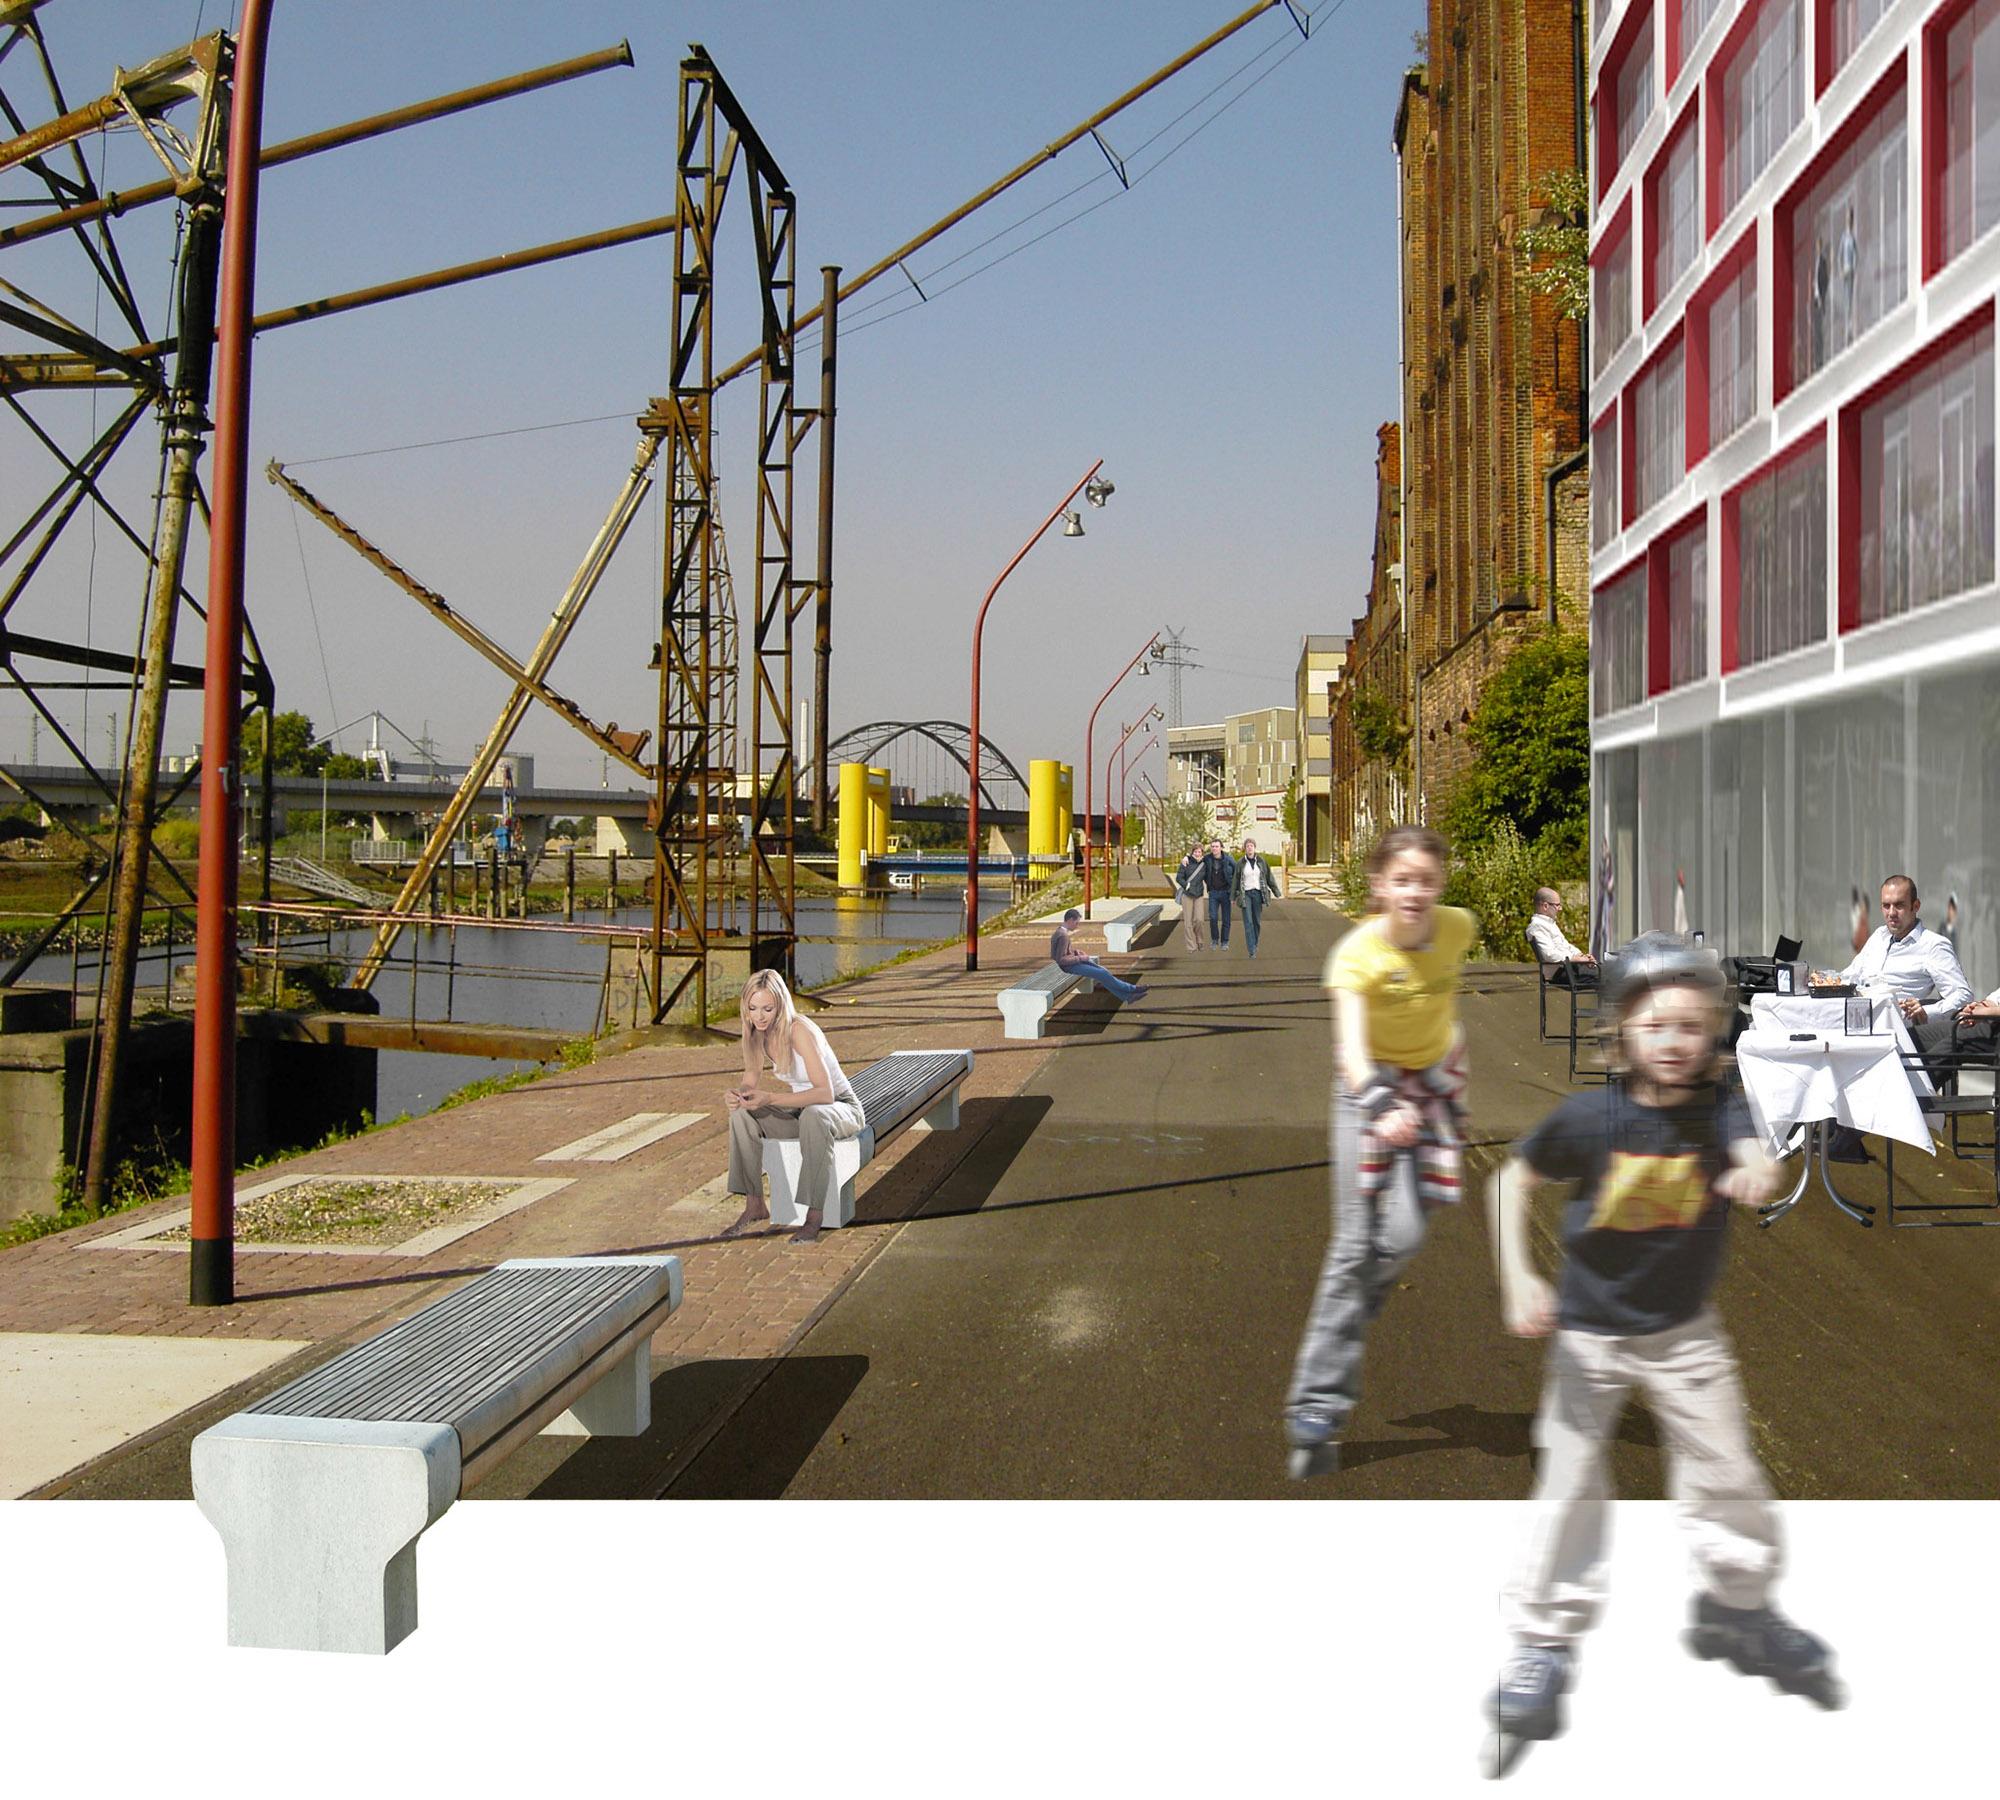 Perspektive 1 Mannheim